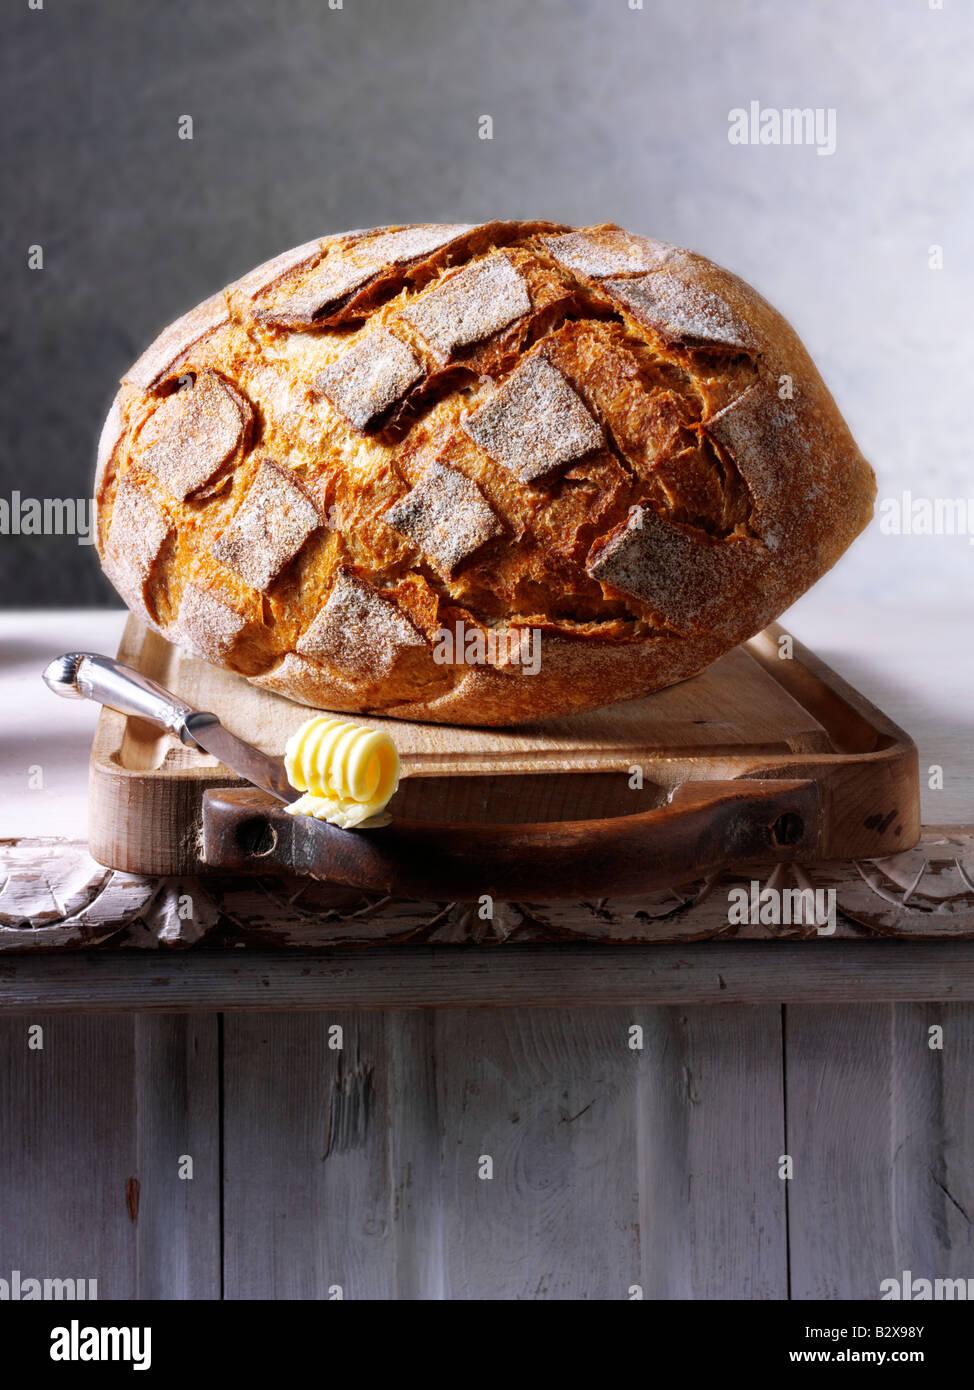 Pane di segale di pane Immagini Stock